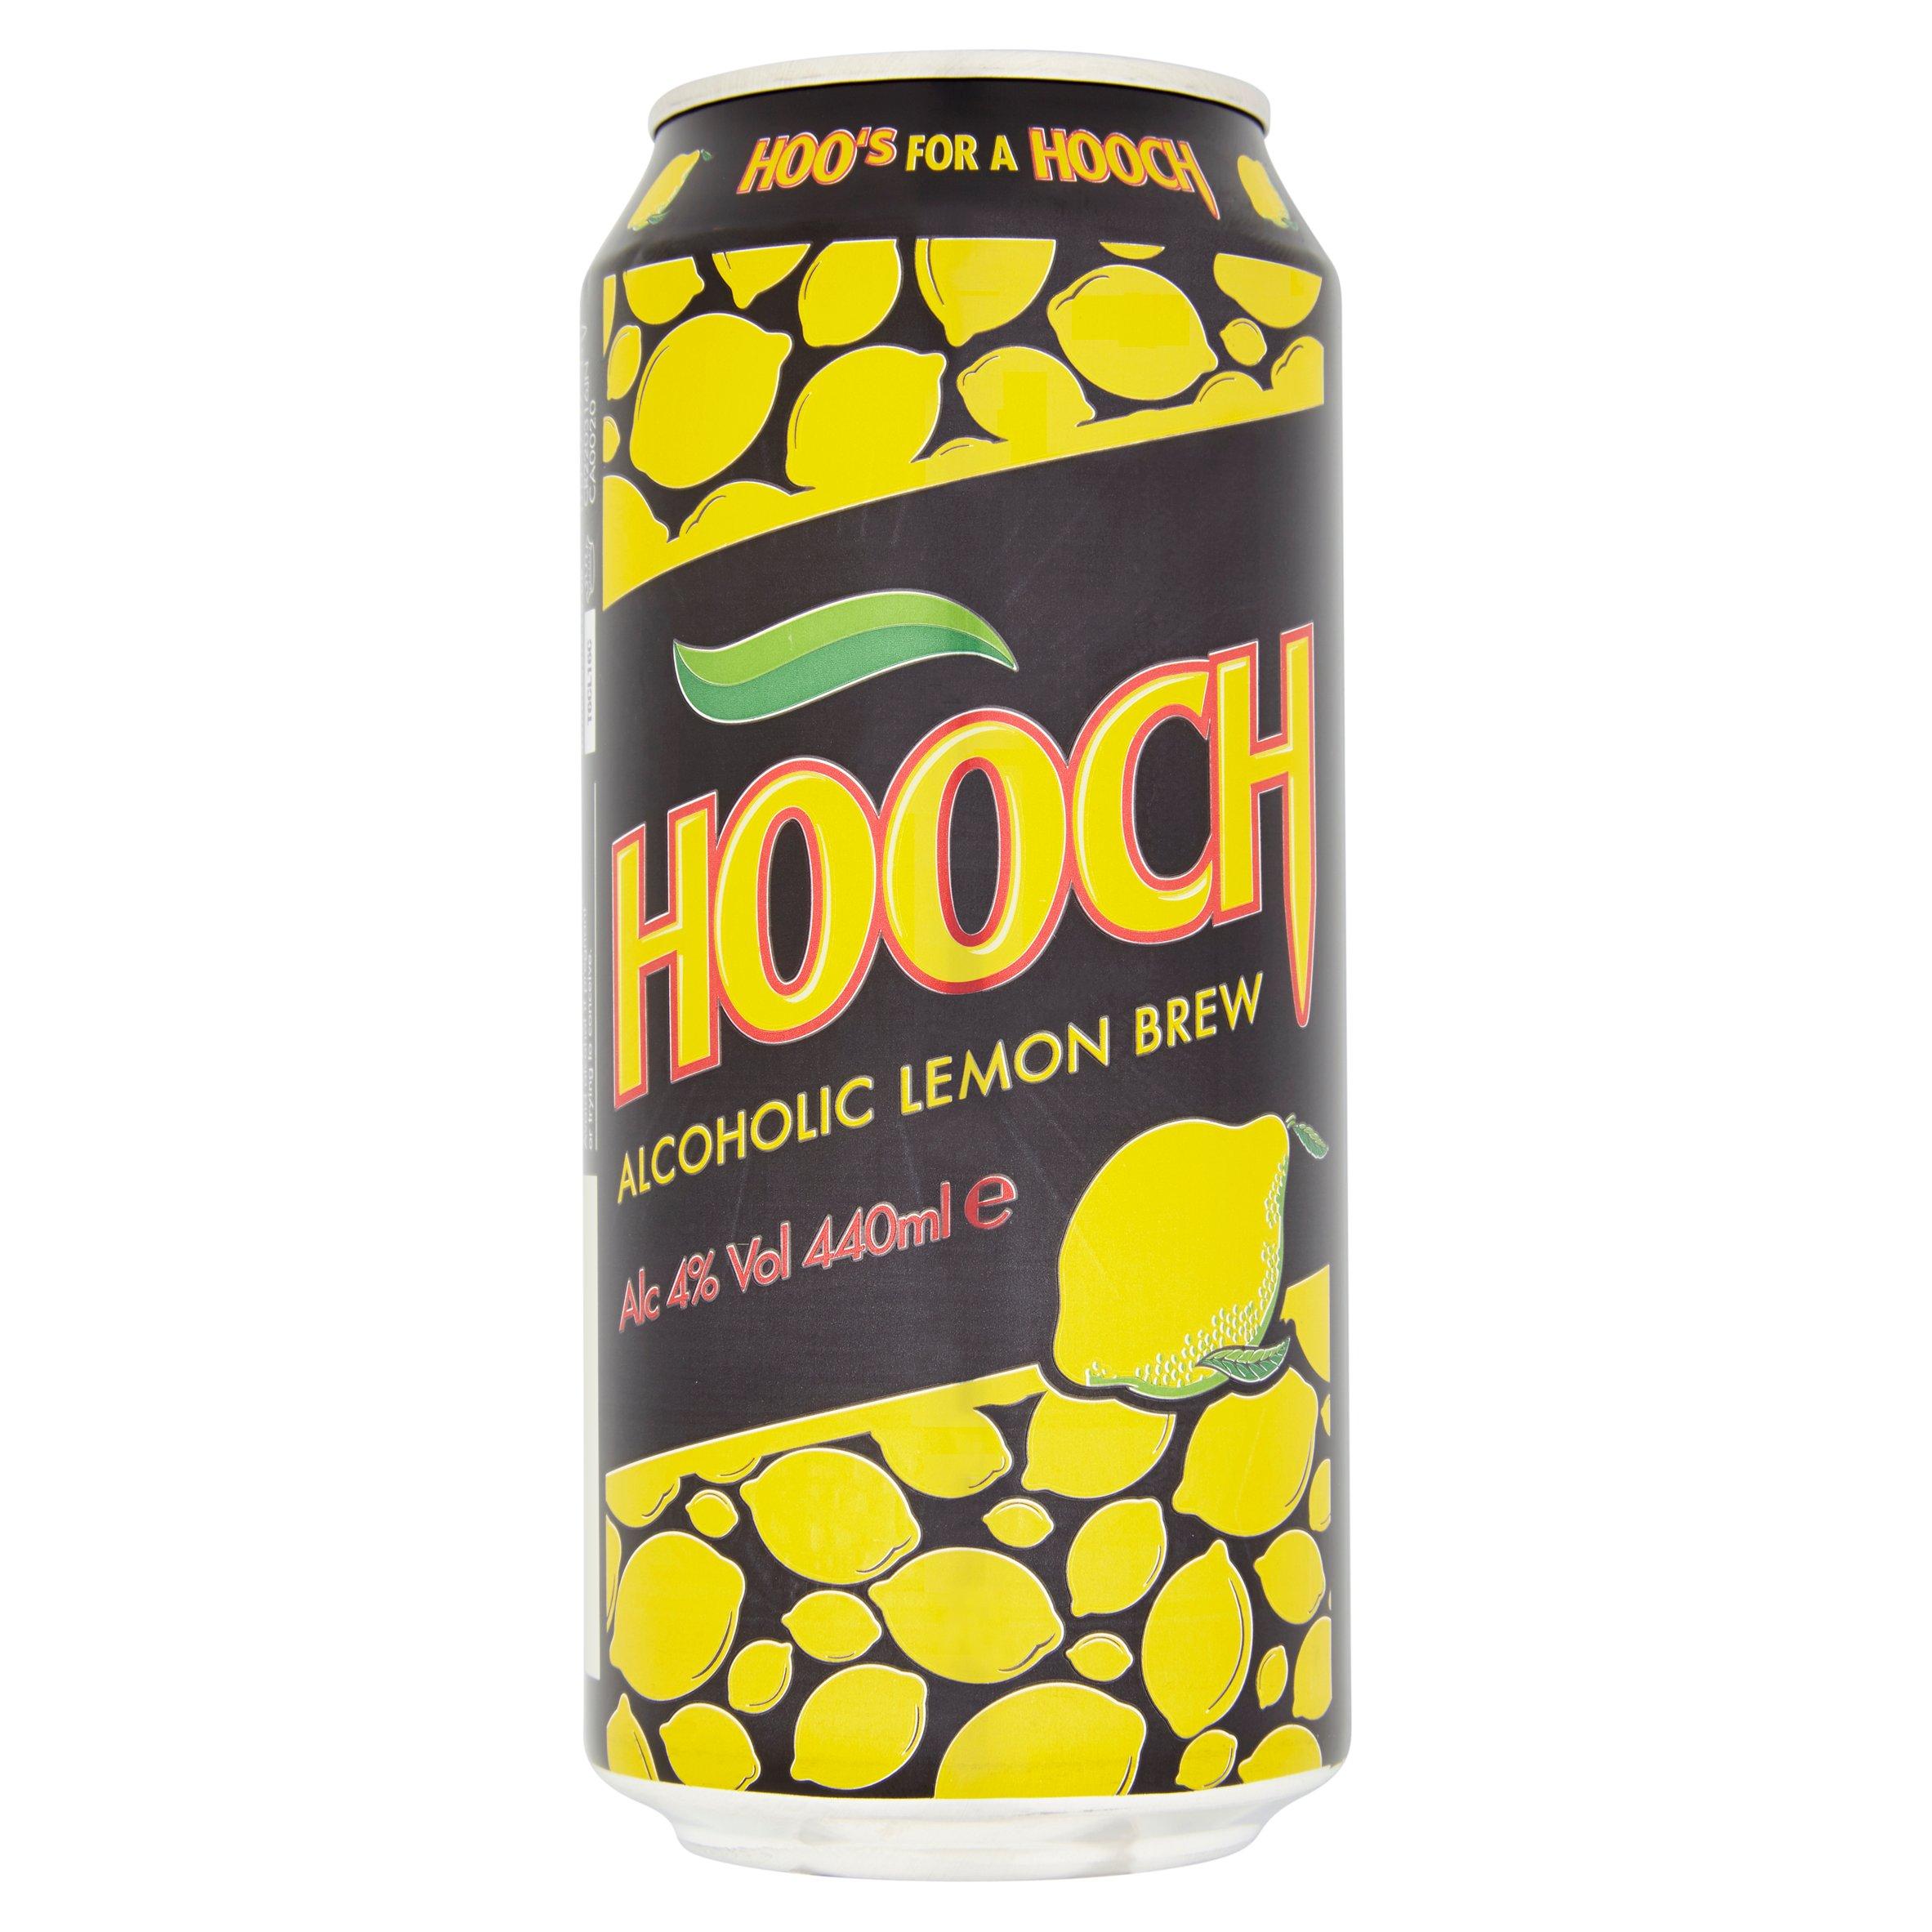 Hooch Alcoholic Lemon Brew 440Ml